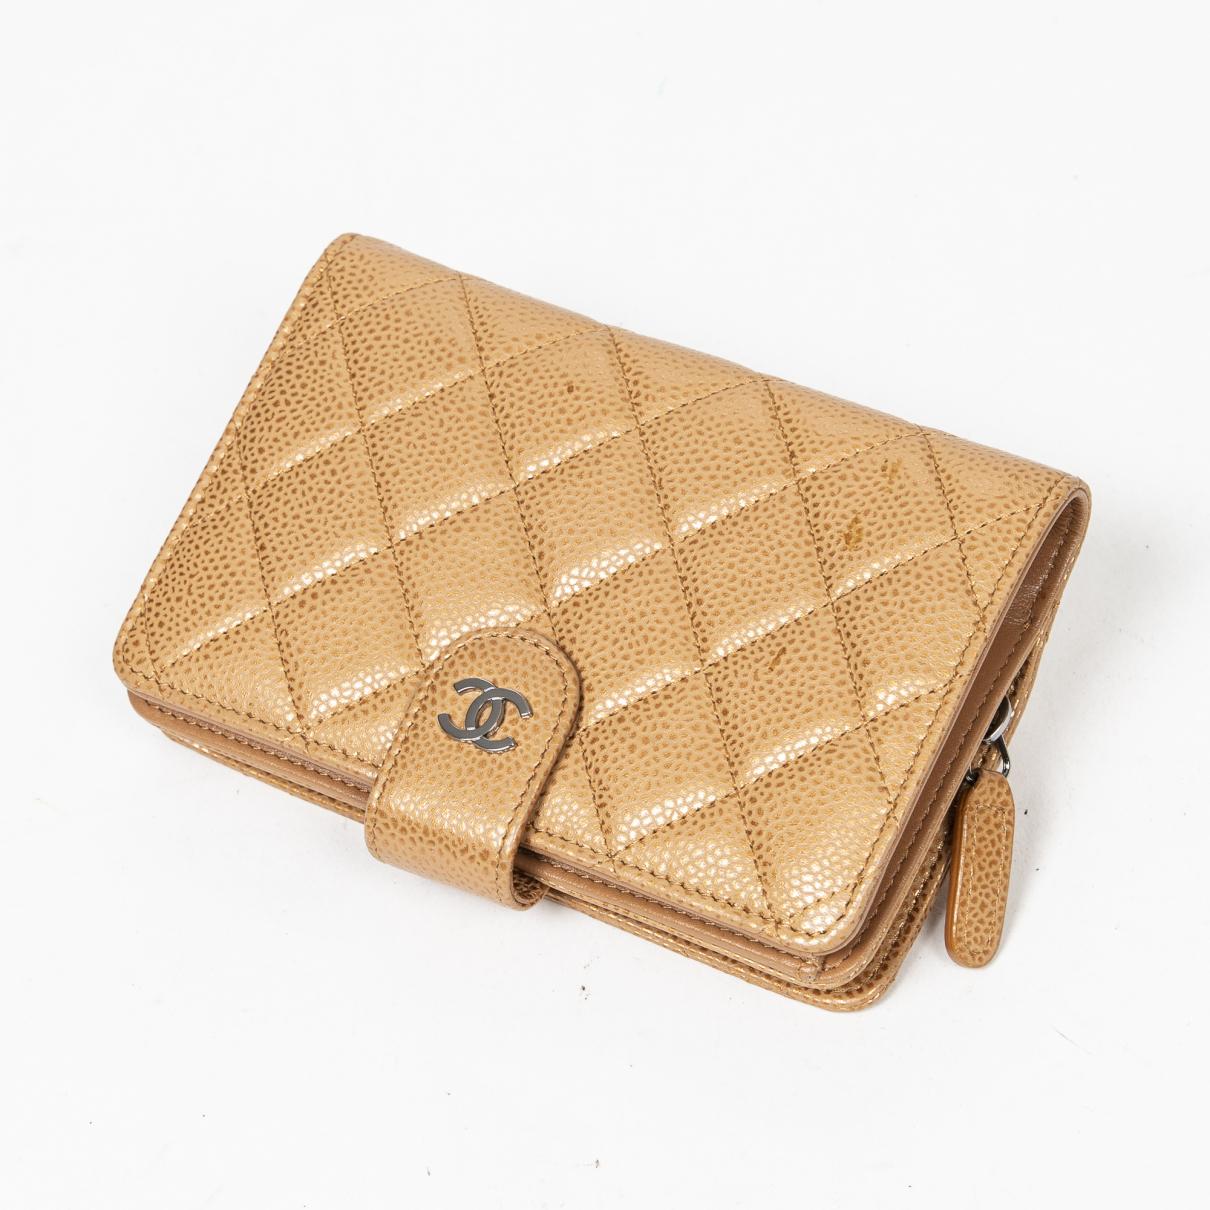 Chanel \N Leather wallet for Women \N